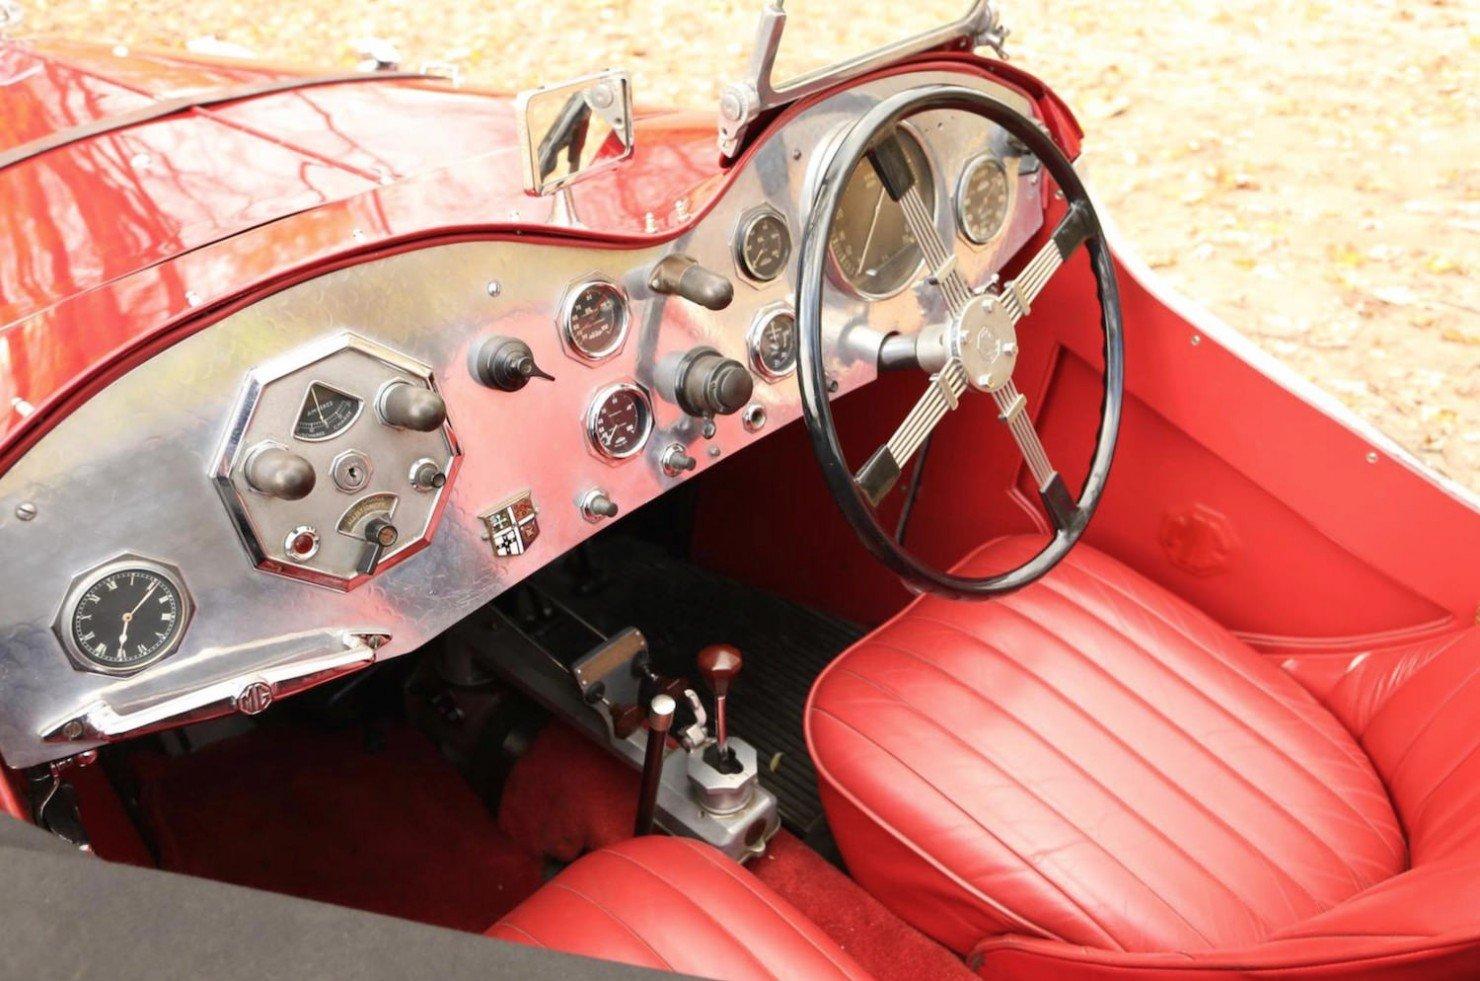 Vintage-MG-Racing-Car-9